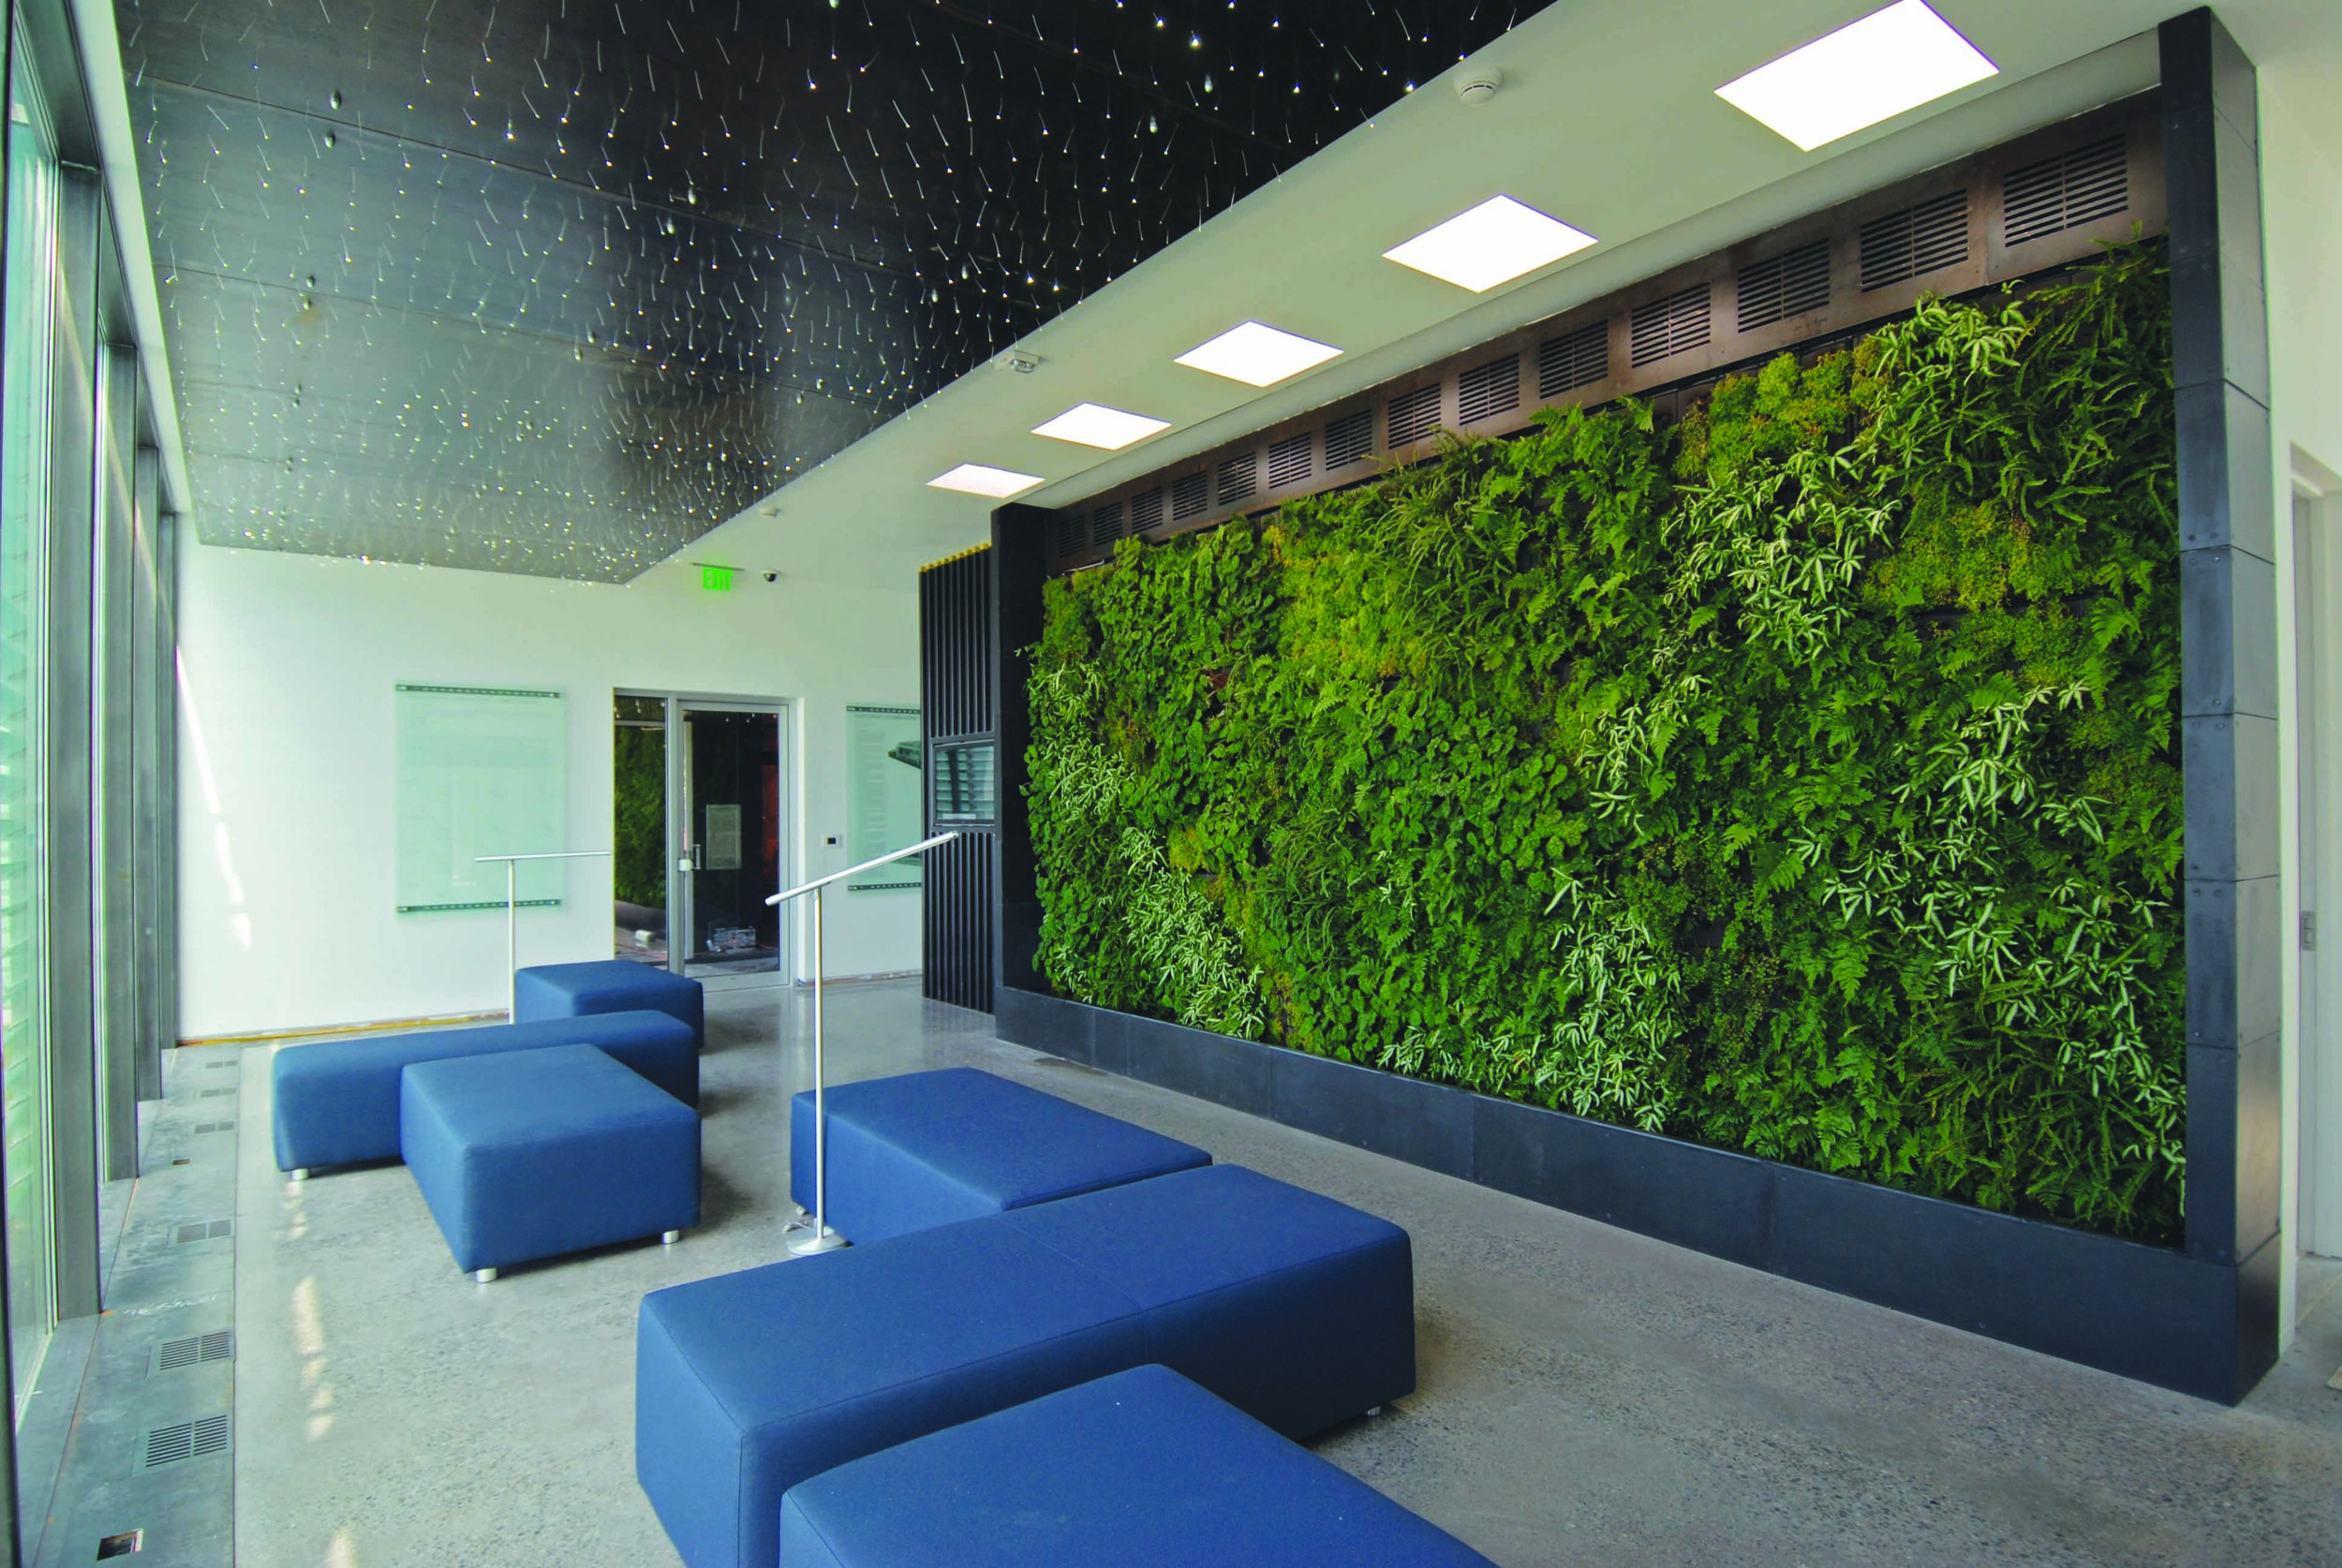 15 Interior View of Lounge.jpg